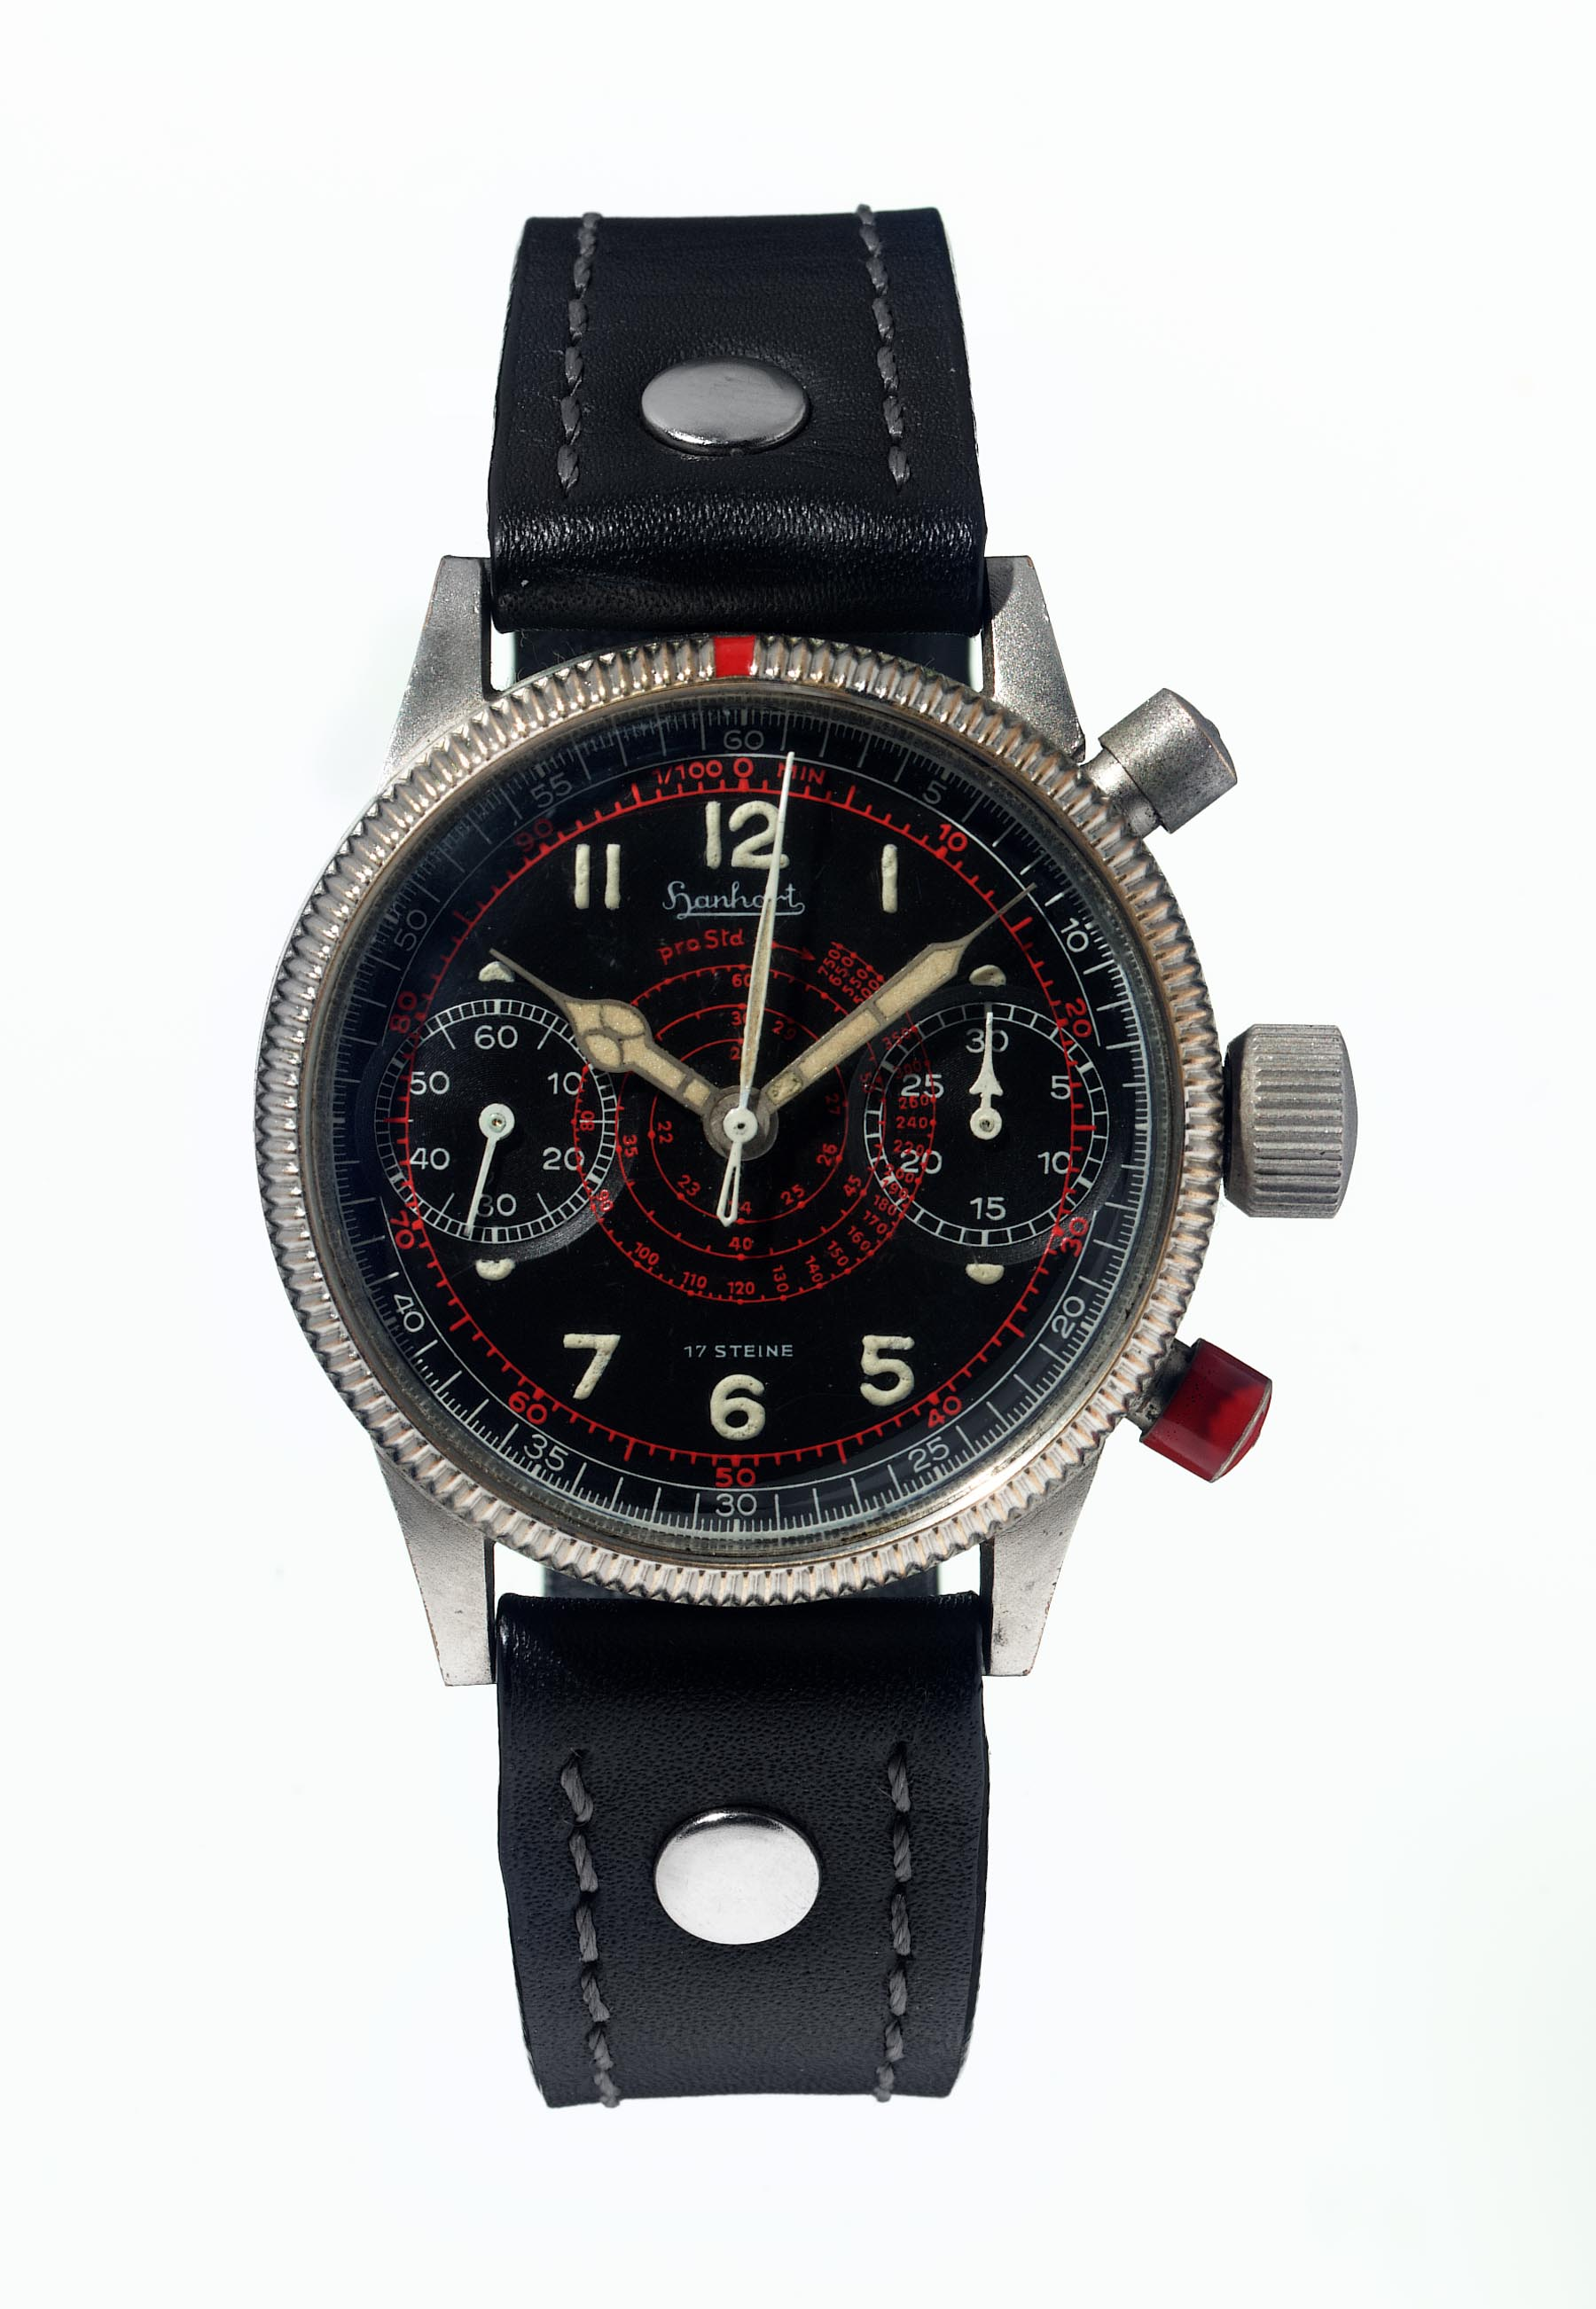 Hanhart TachyTele WW2 World War 2 Original Vintage German Military Watch